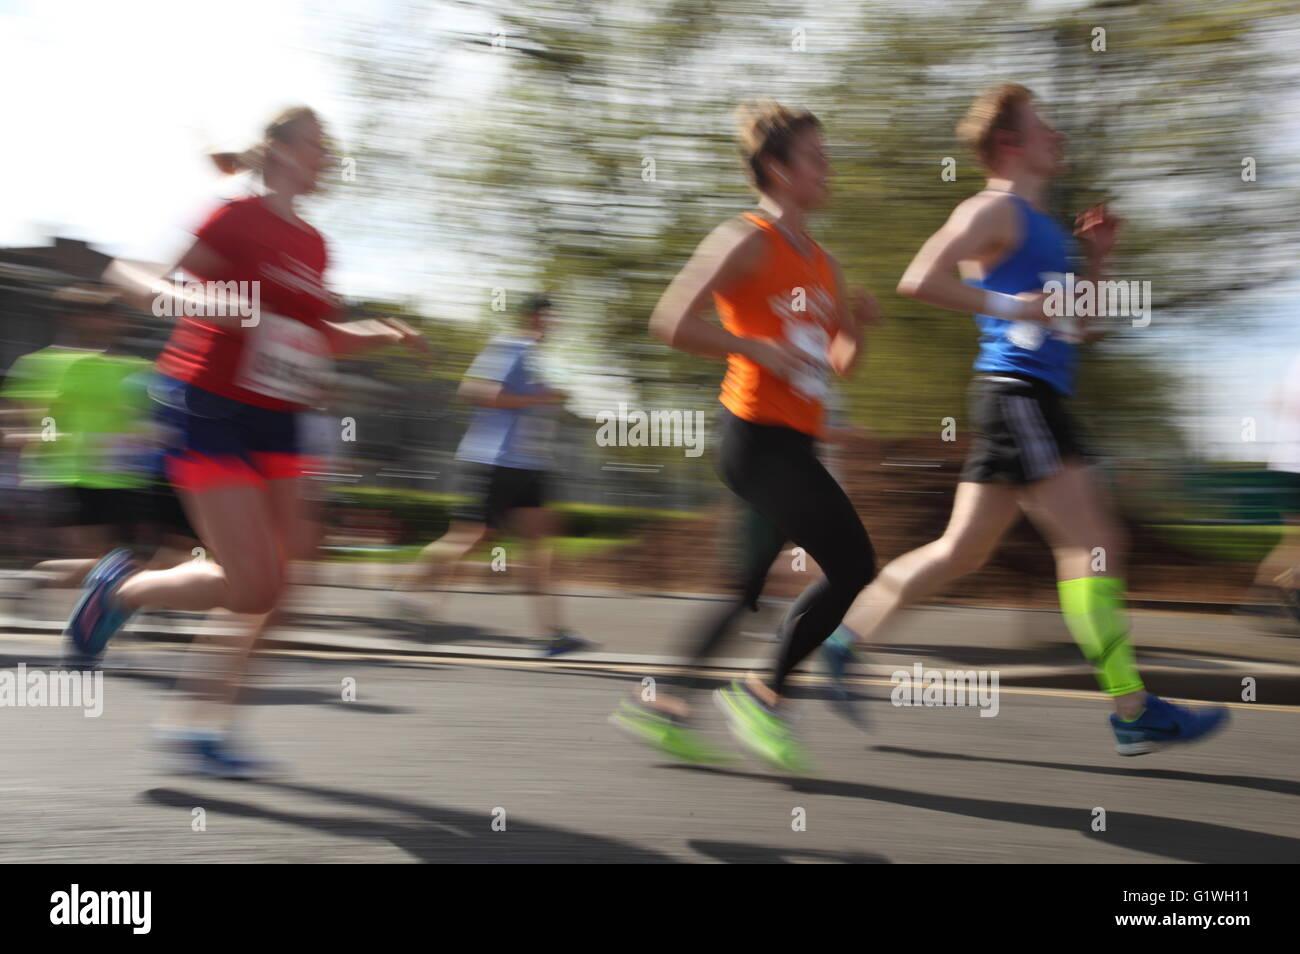 may 2016 London Uk people running at Hackney Run  half marathon - Stock Image